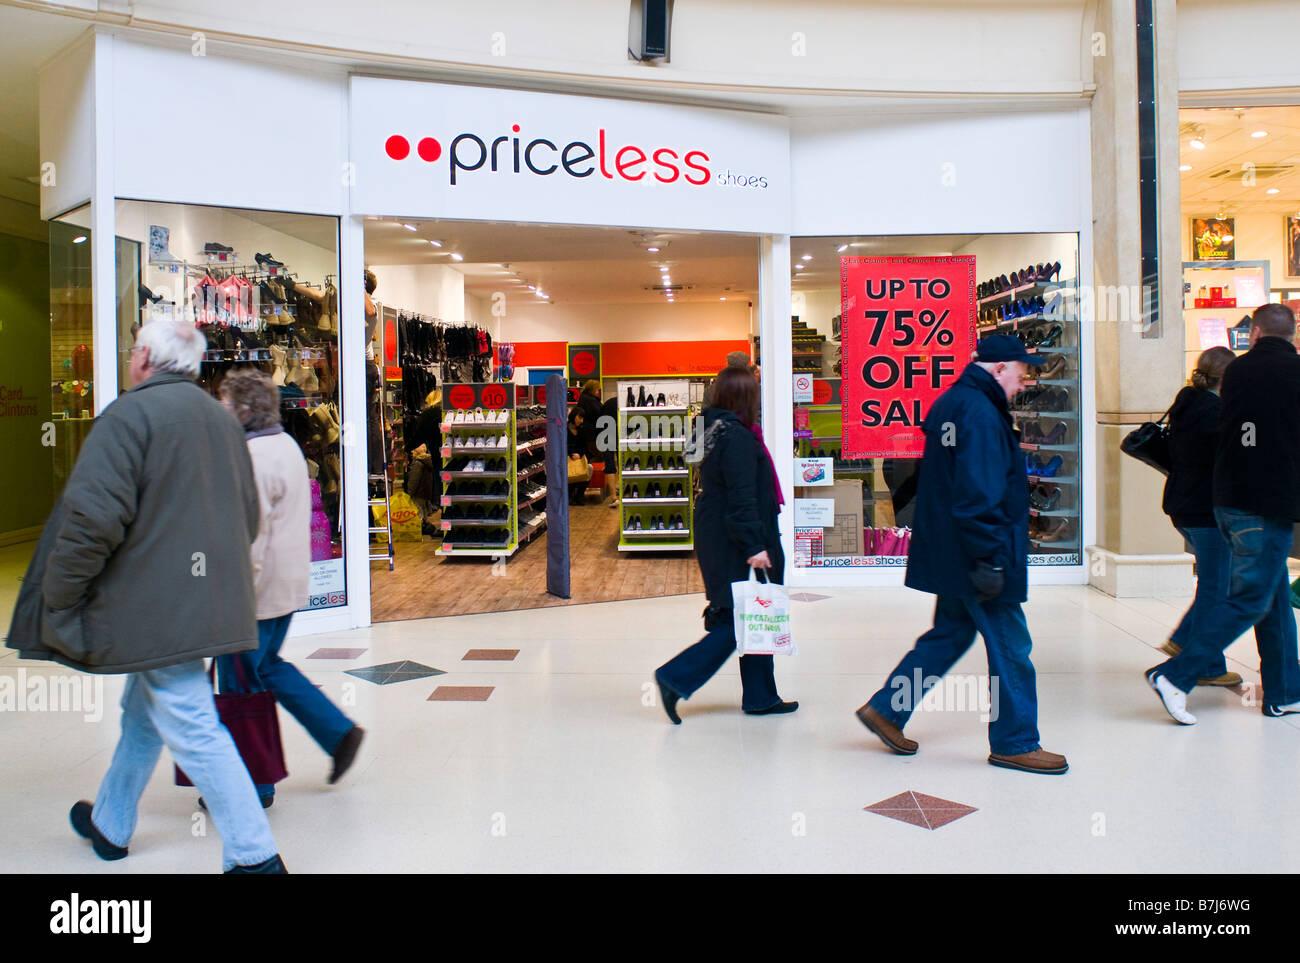 Priceless storefront - Stock Image